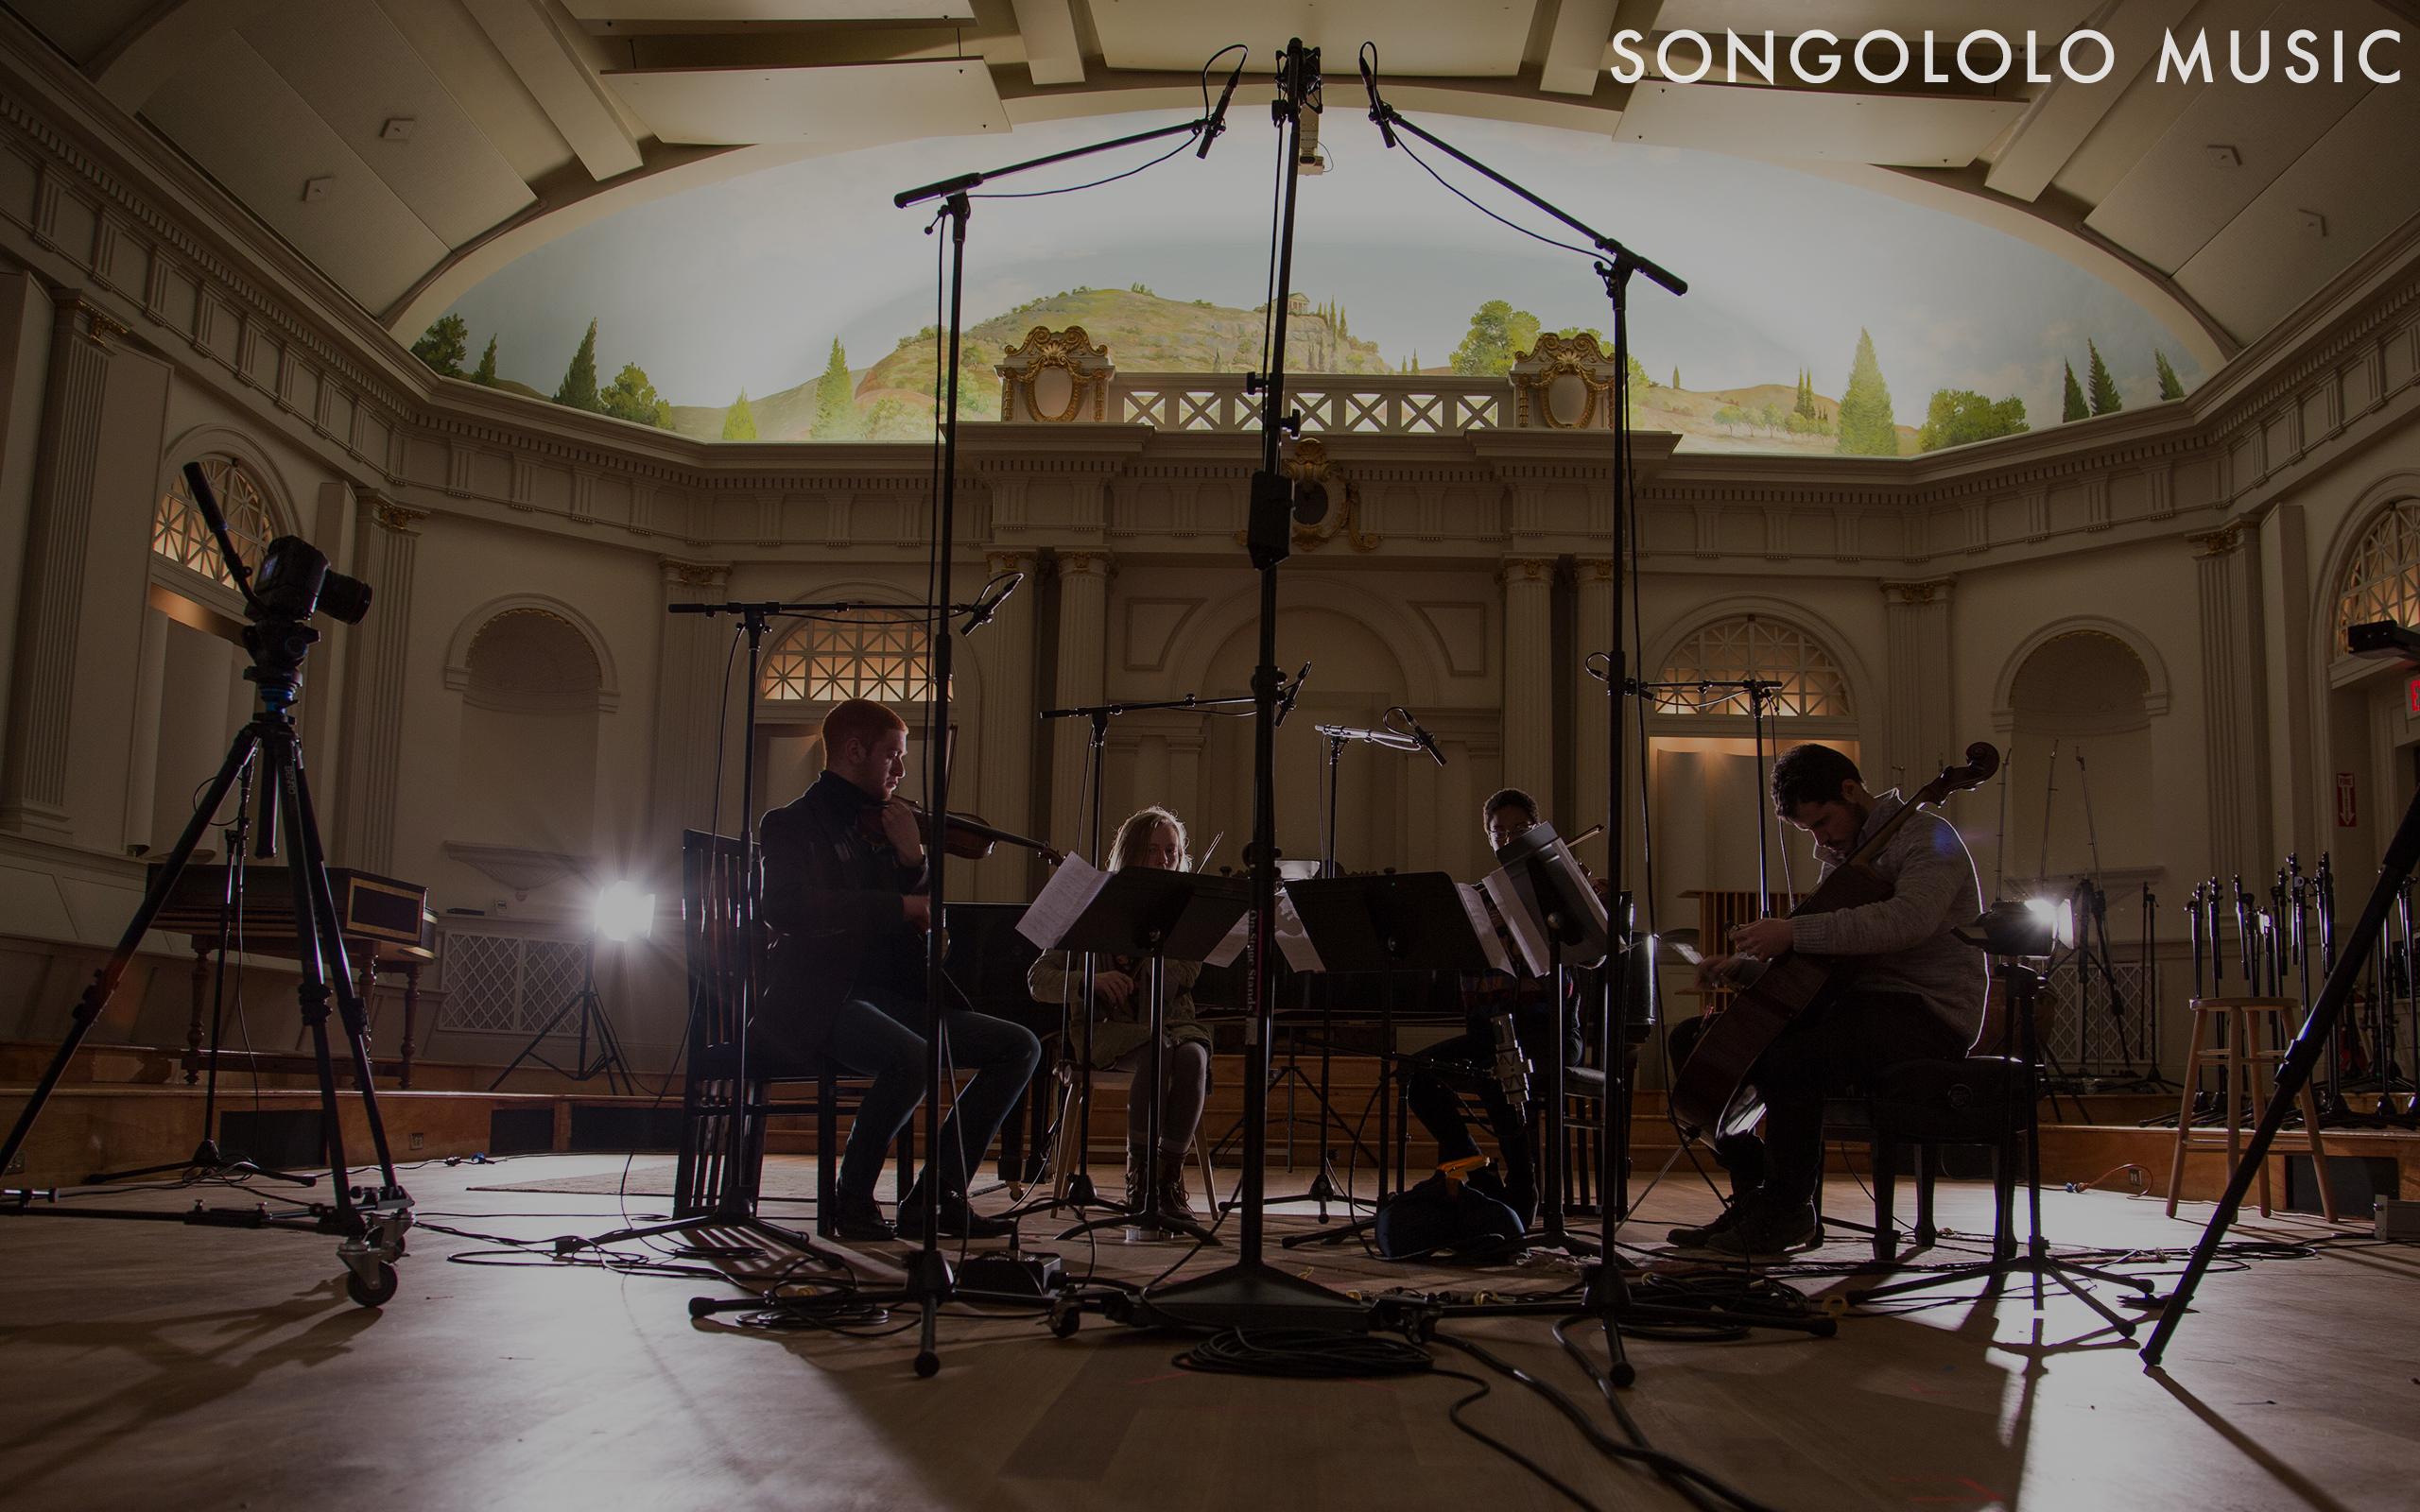 Songololo_music_banner